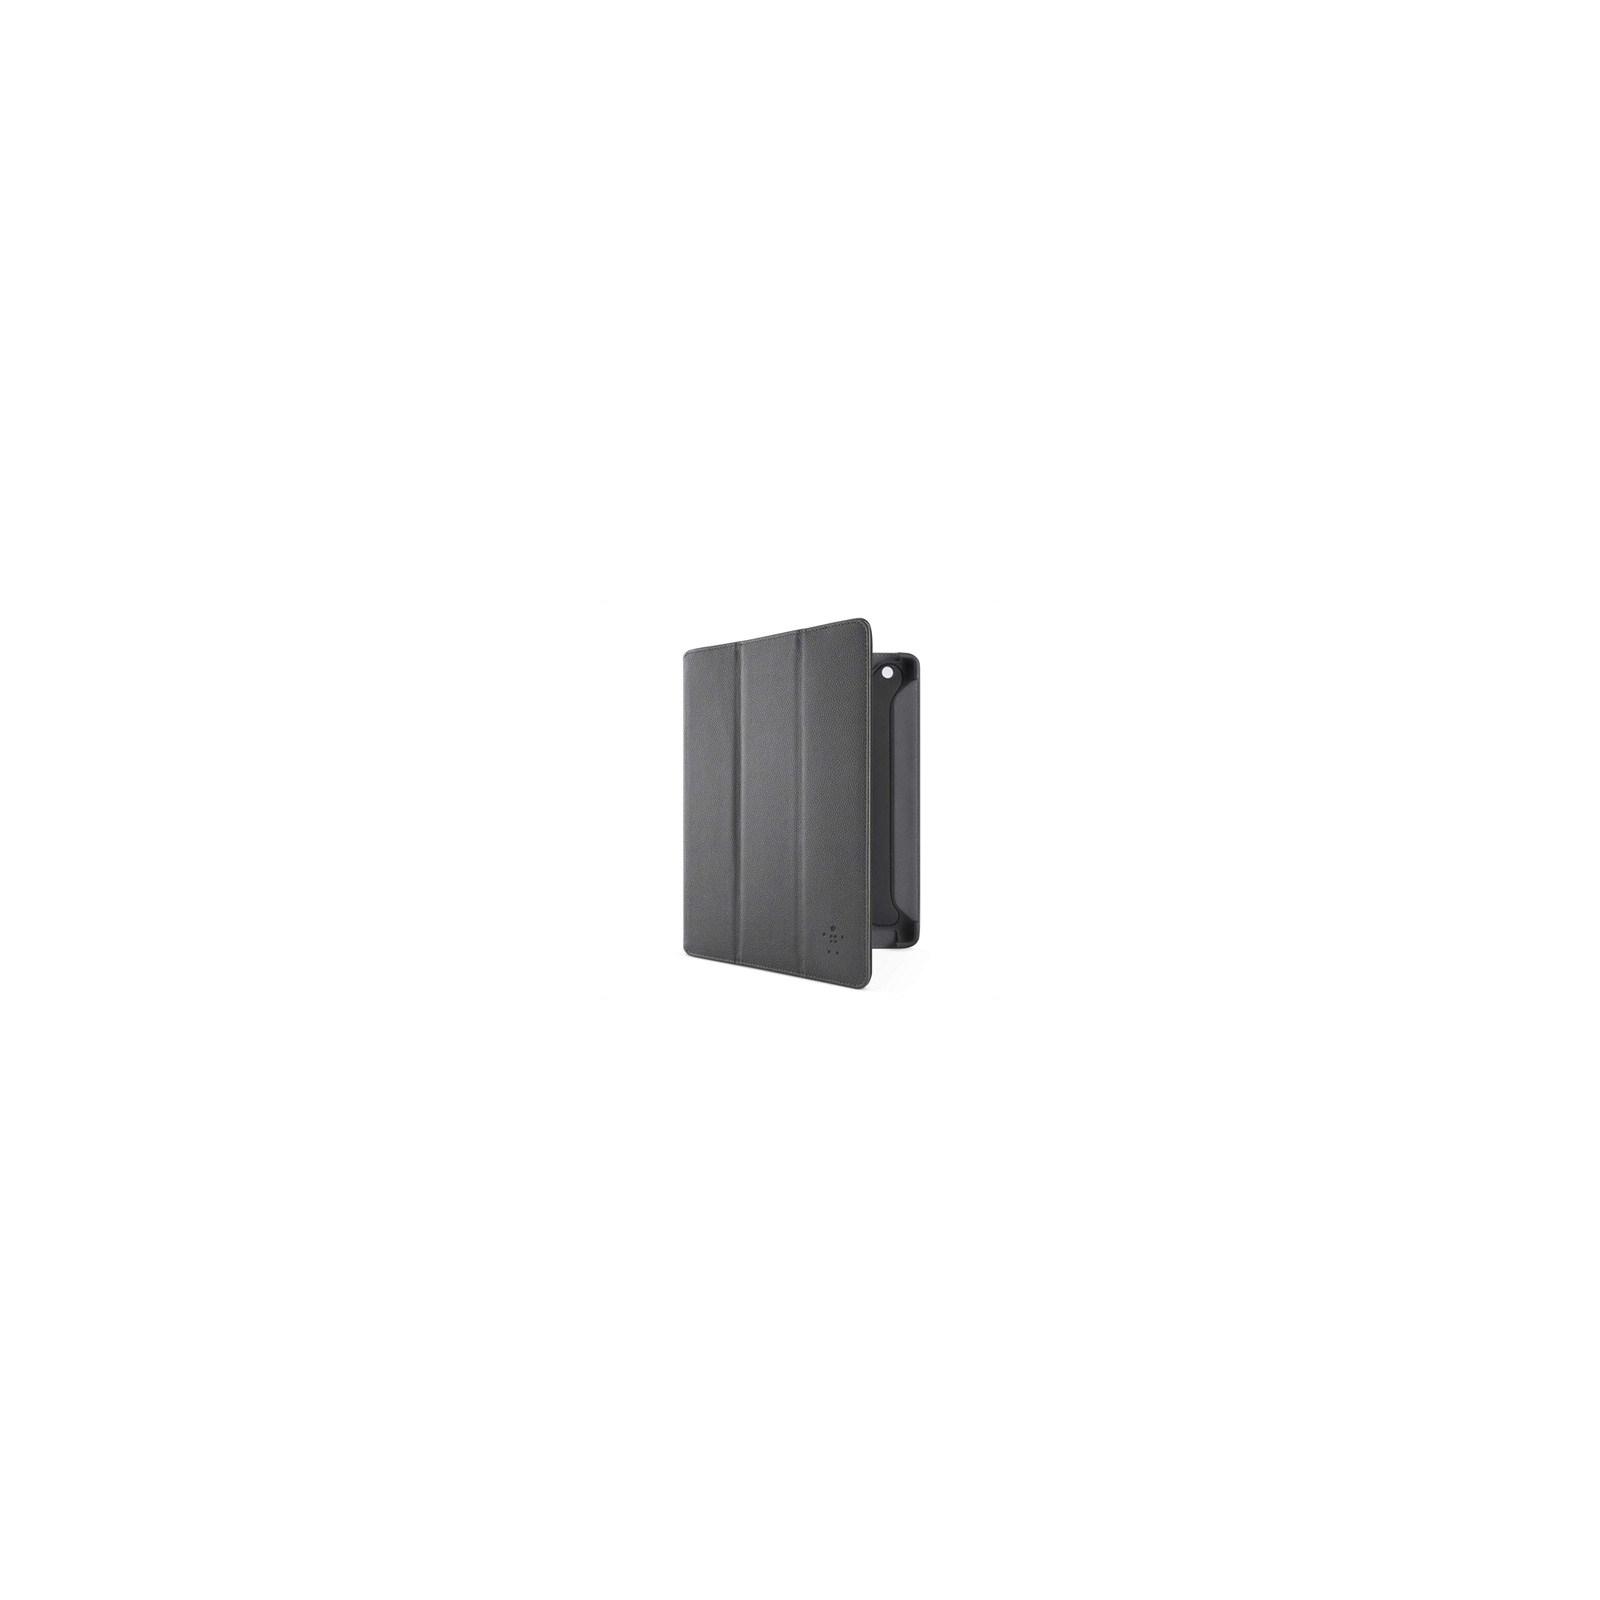 Чехол для планшета Belkin Folio Trifold Magnet PU/LTHR (Black) (F8N755cwC00)